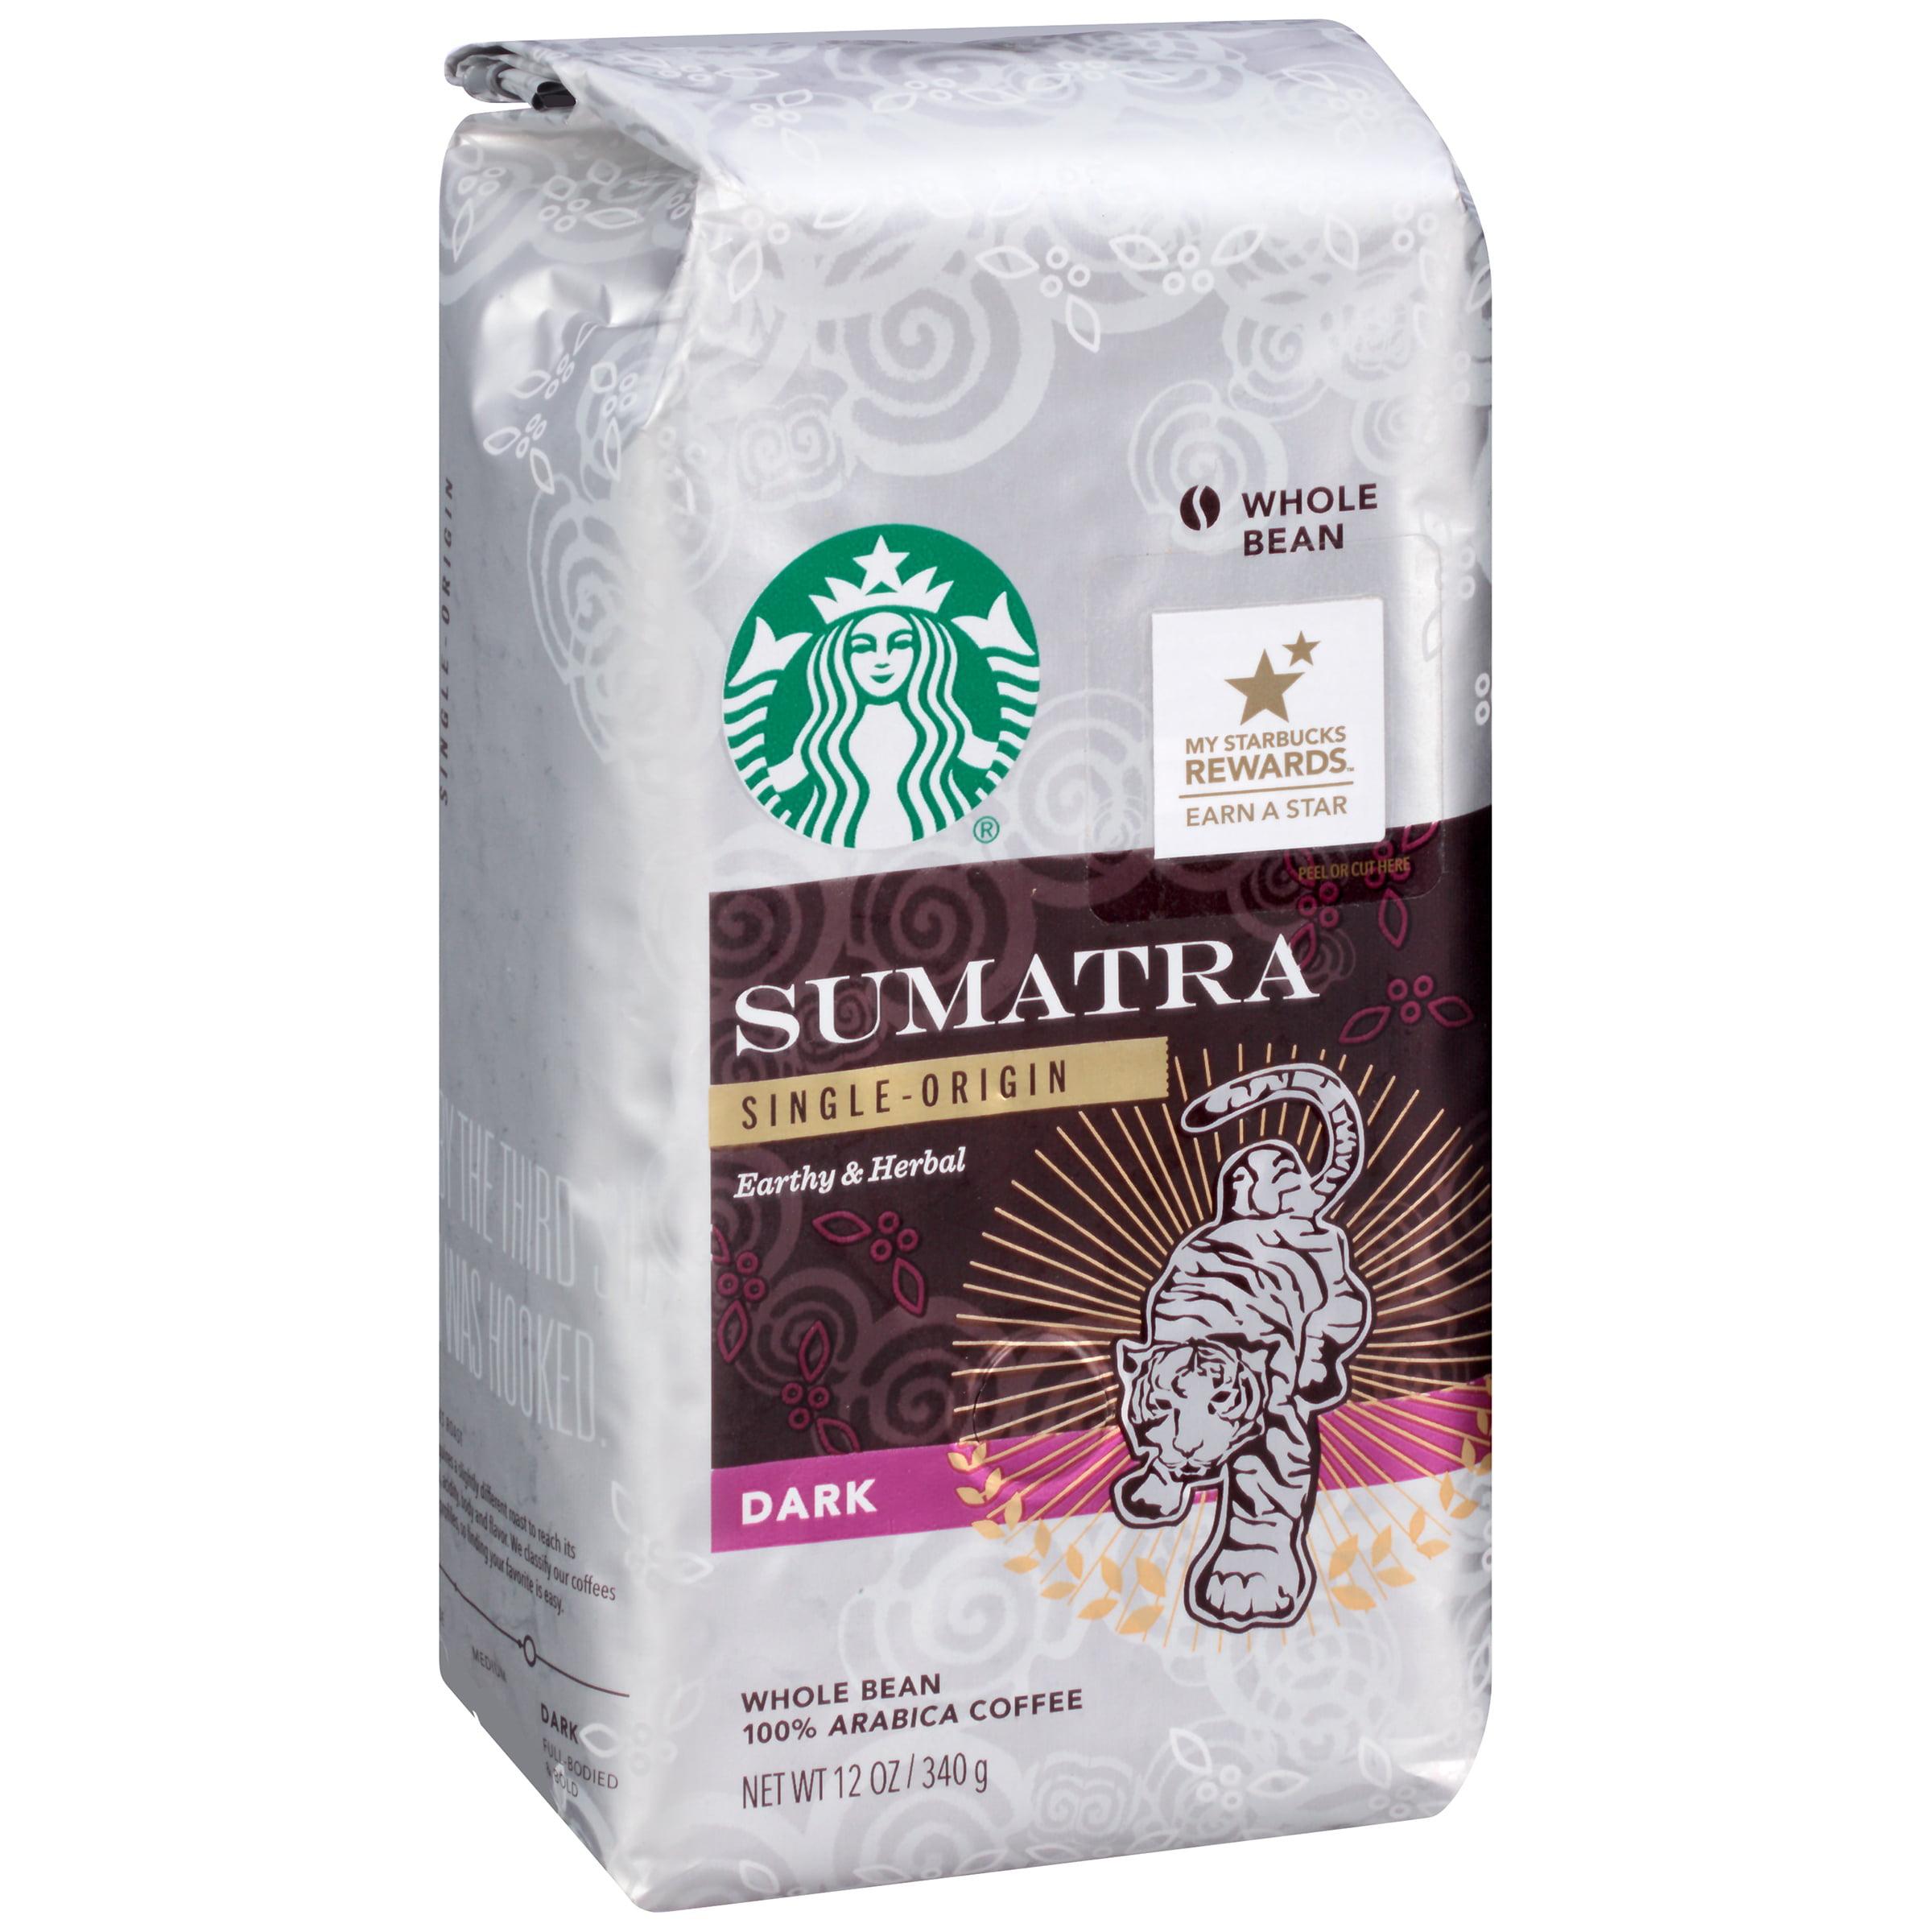 Sumatra Single-Origin Earthy & Herbal Dark 12 oz. Whole Bean Package